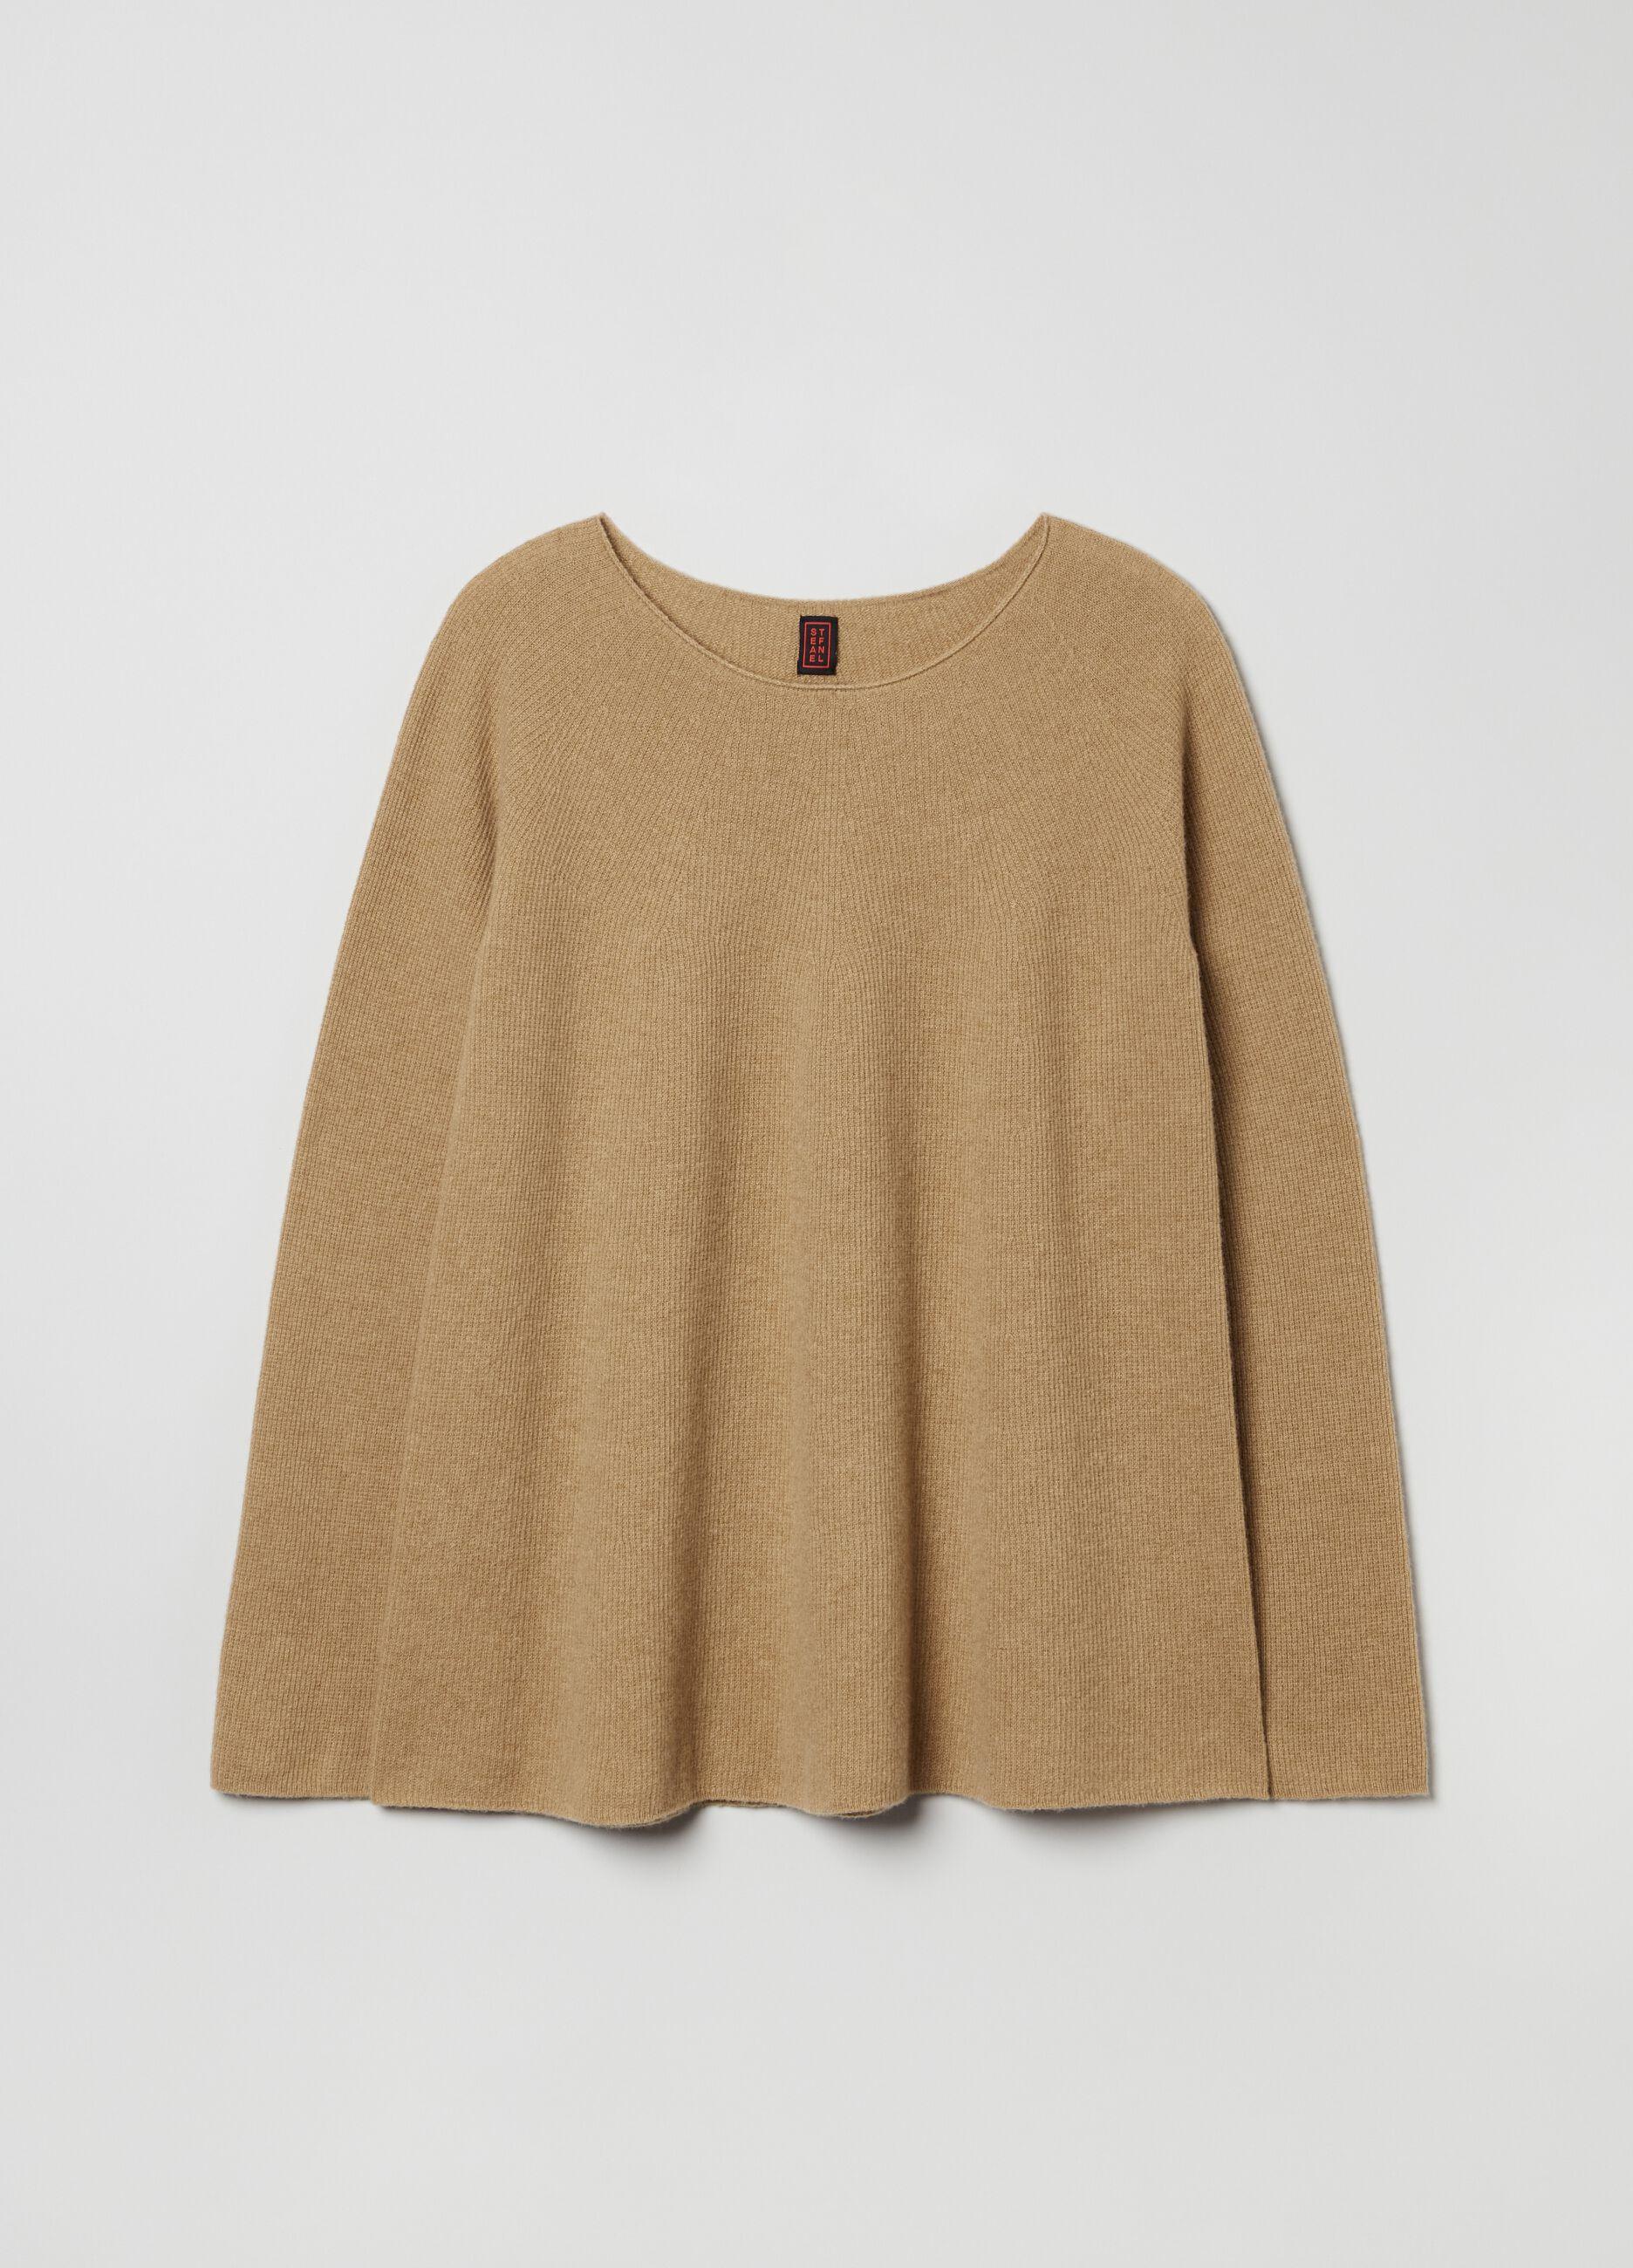 Pullover in pura lana senza cuciture Marrone